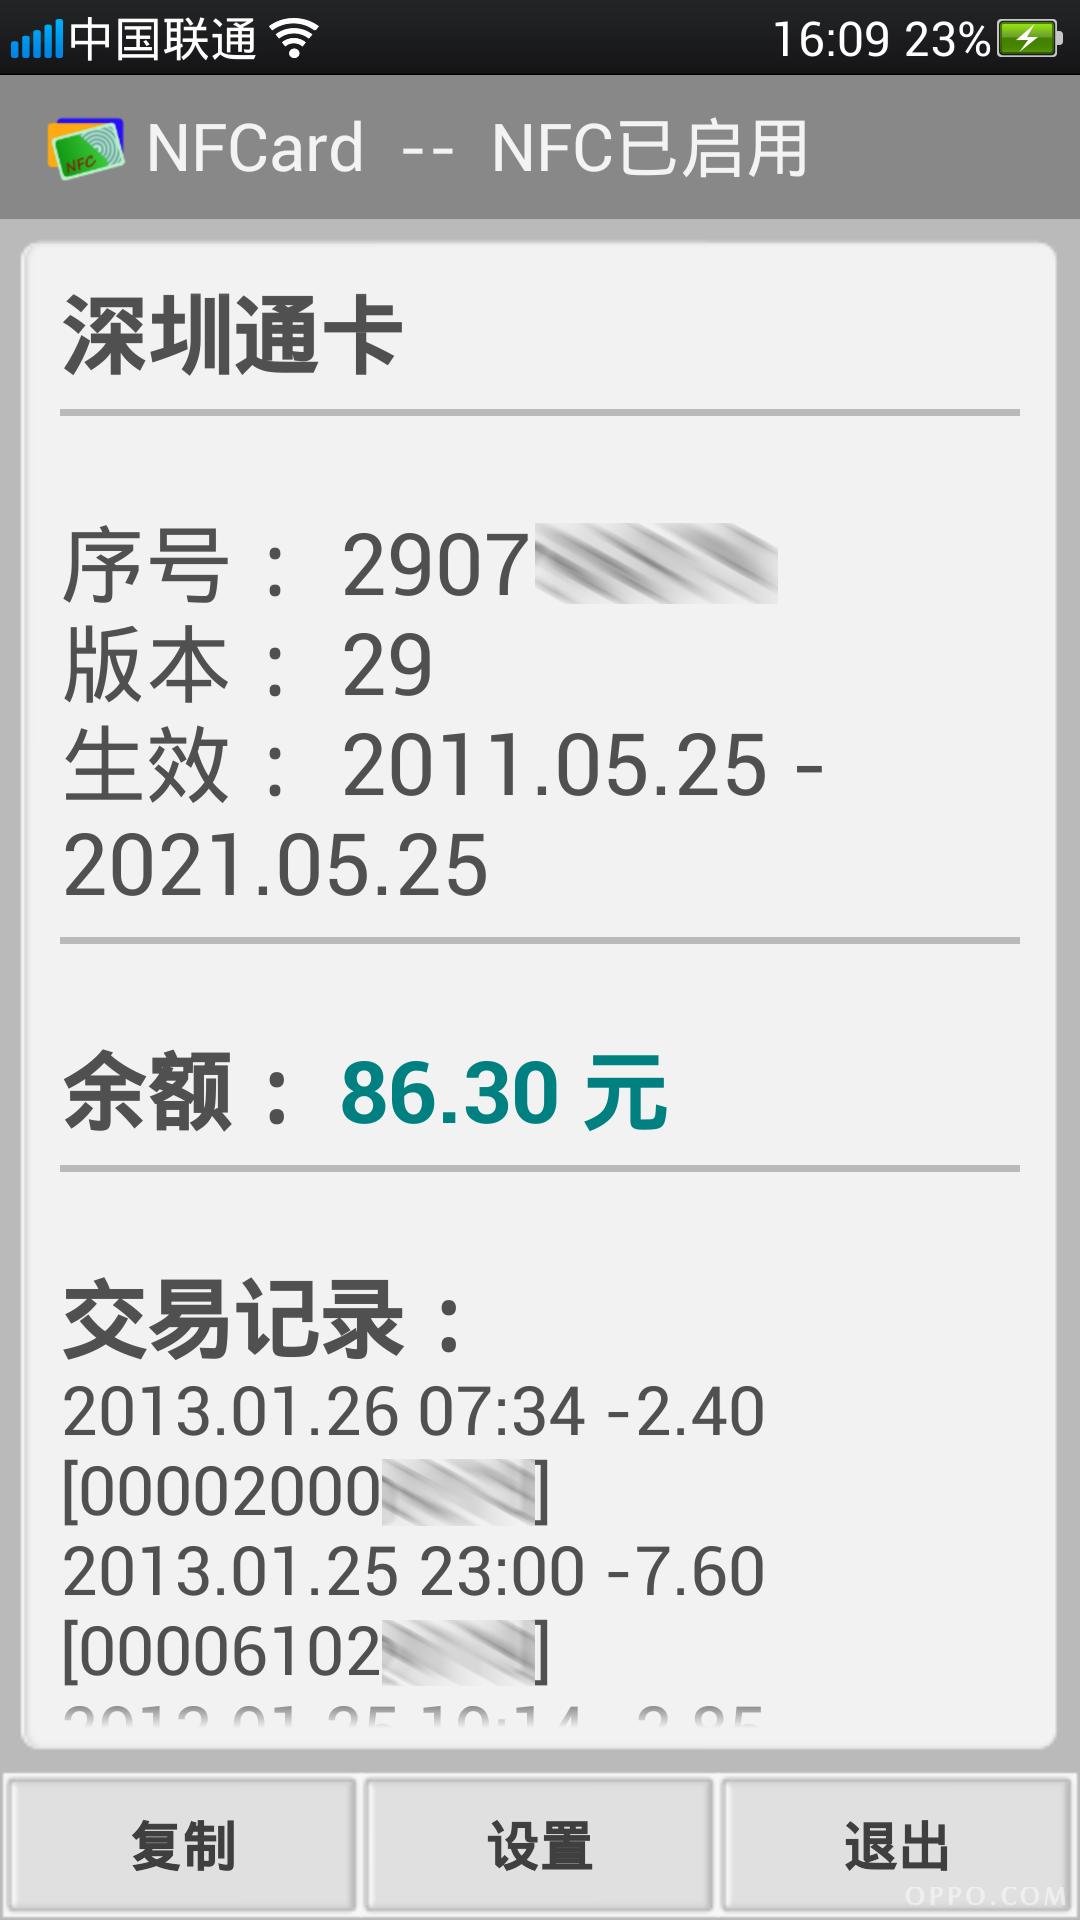 NFCard(可读取公交卡信息)截图